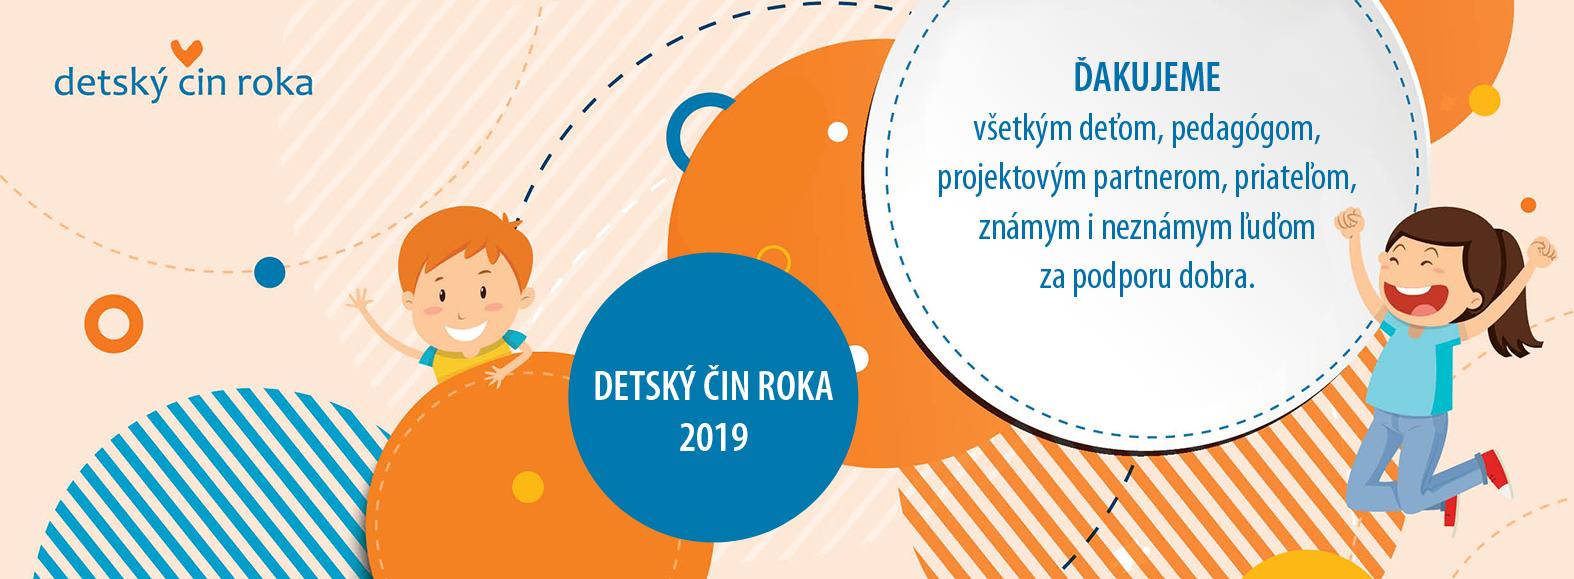 dcr-dakovanie-2019-2